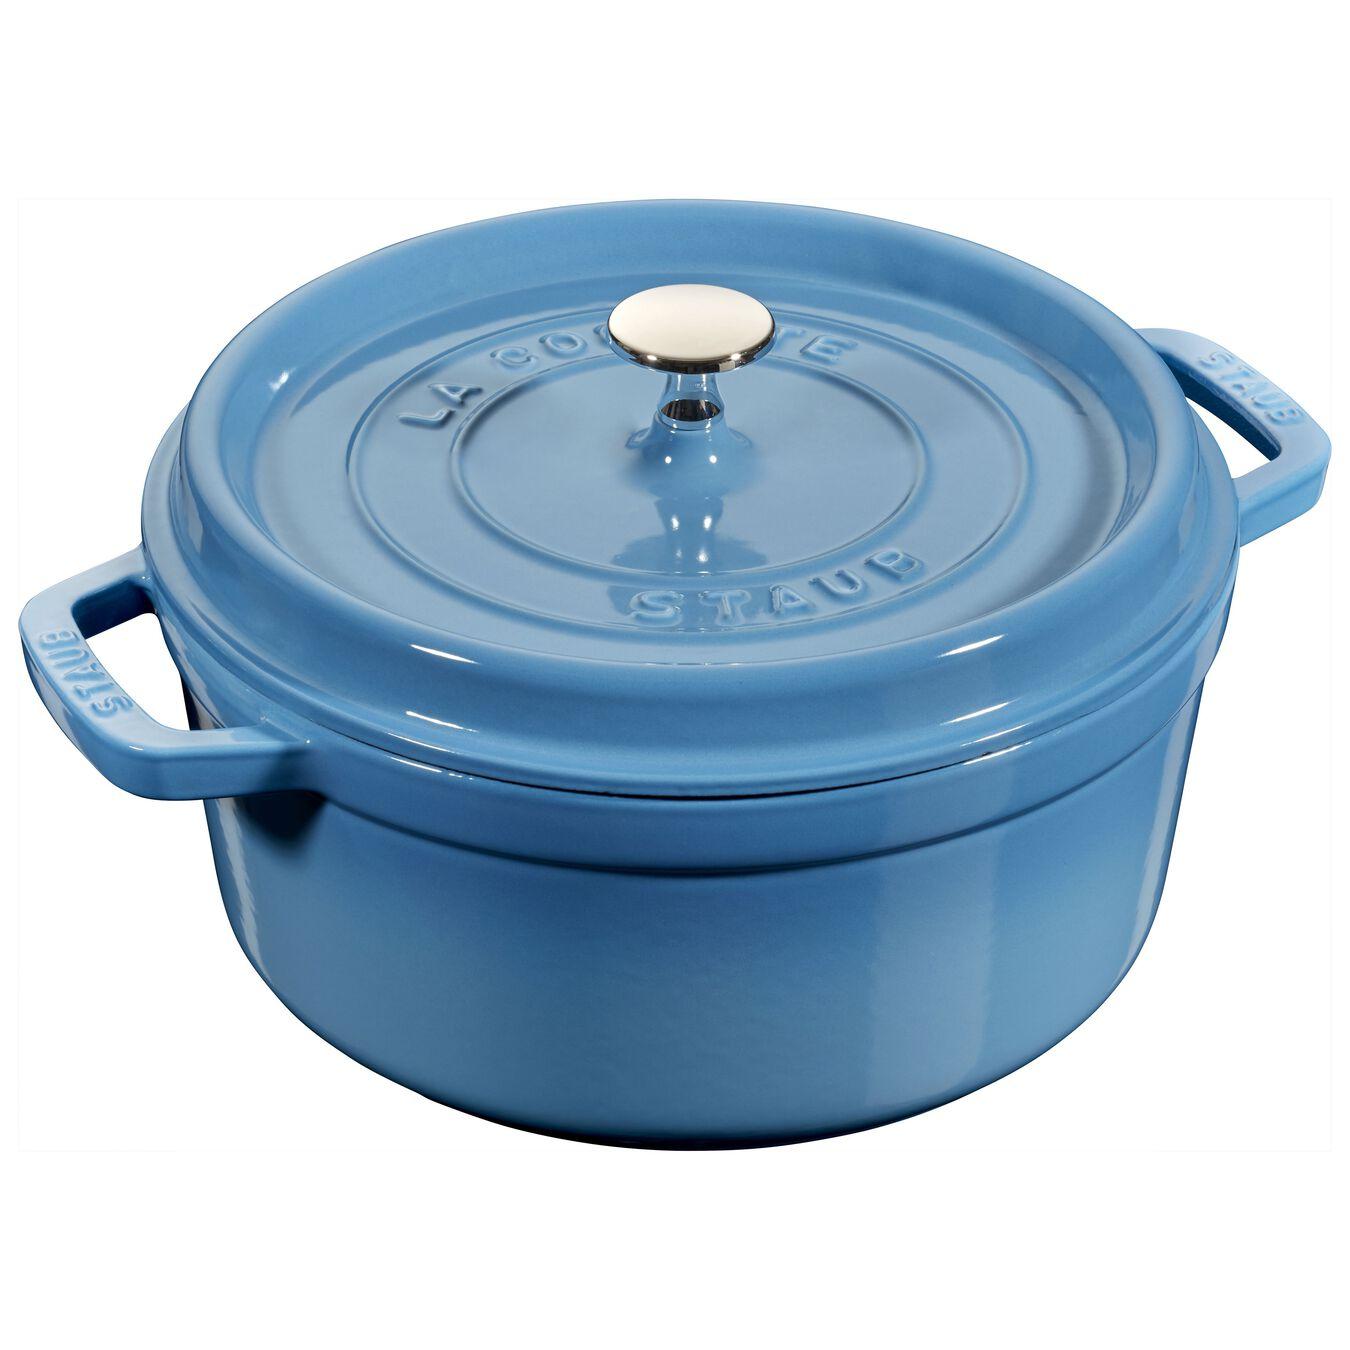 5,25 l Cast iron round Faitout, Ice-Blue,,large 1